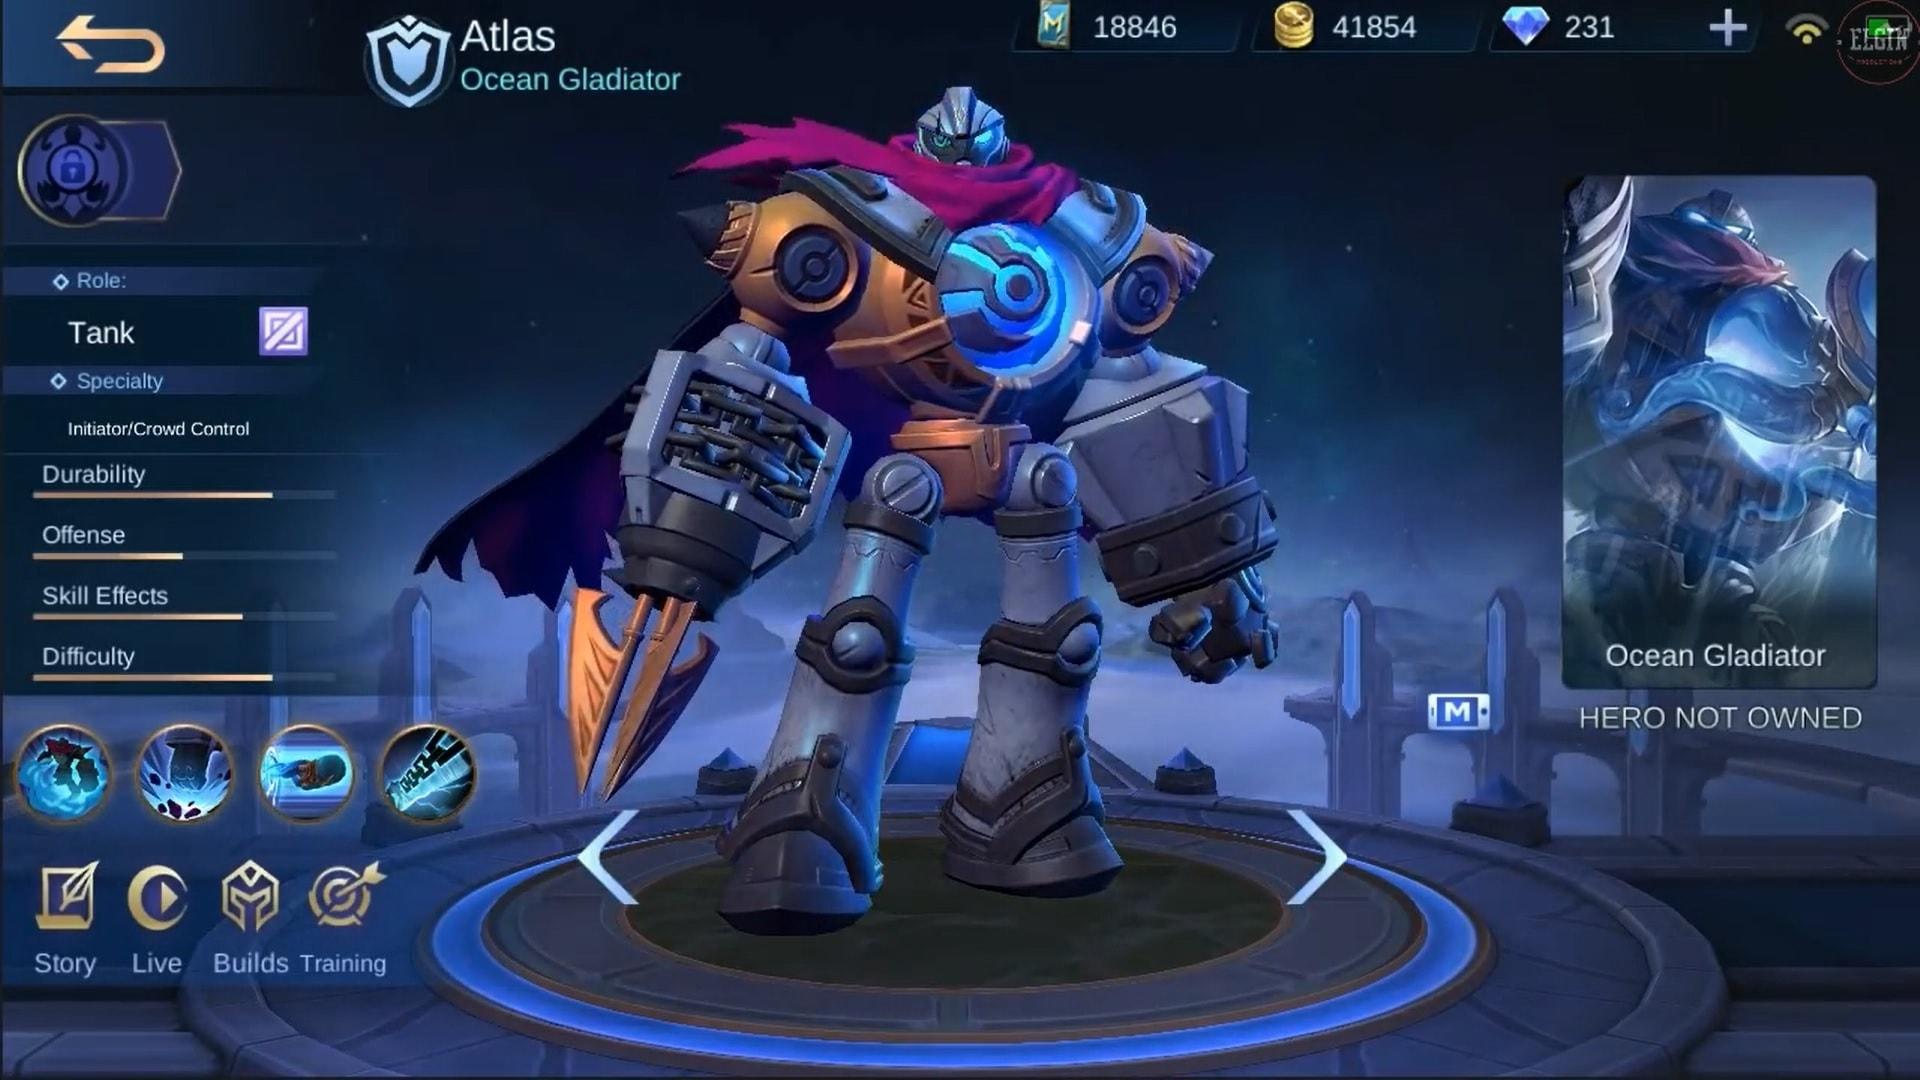 Explicación de Skill Atlas Mobile Legends (ML)